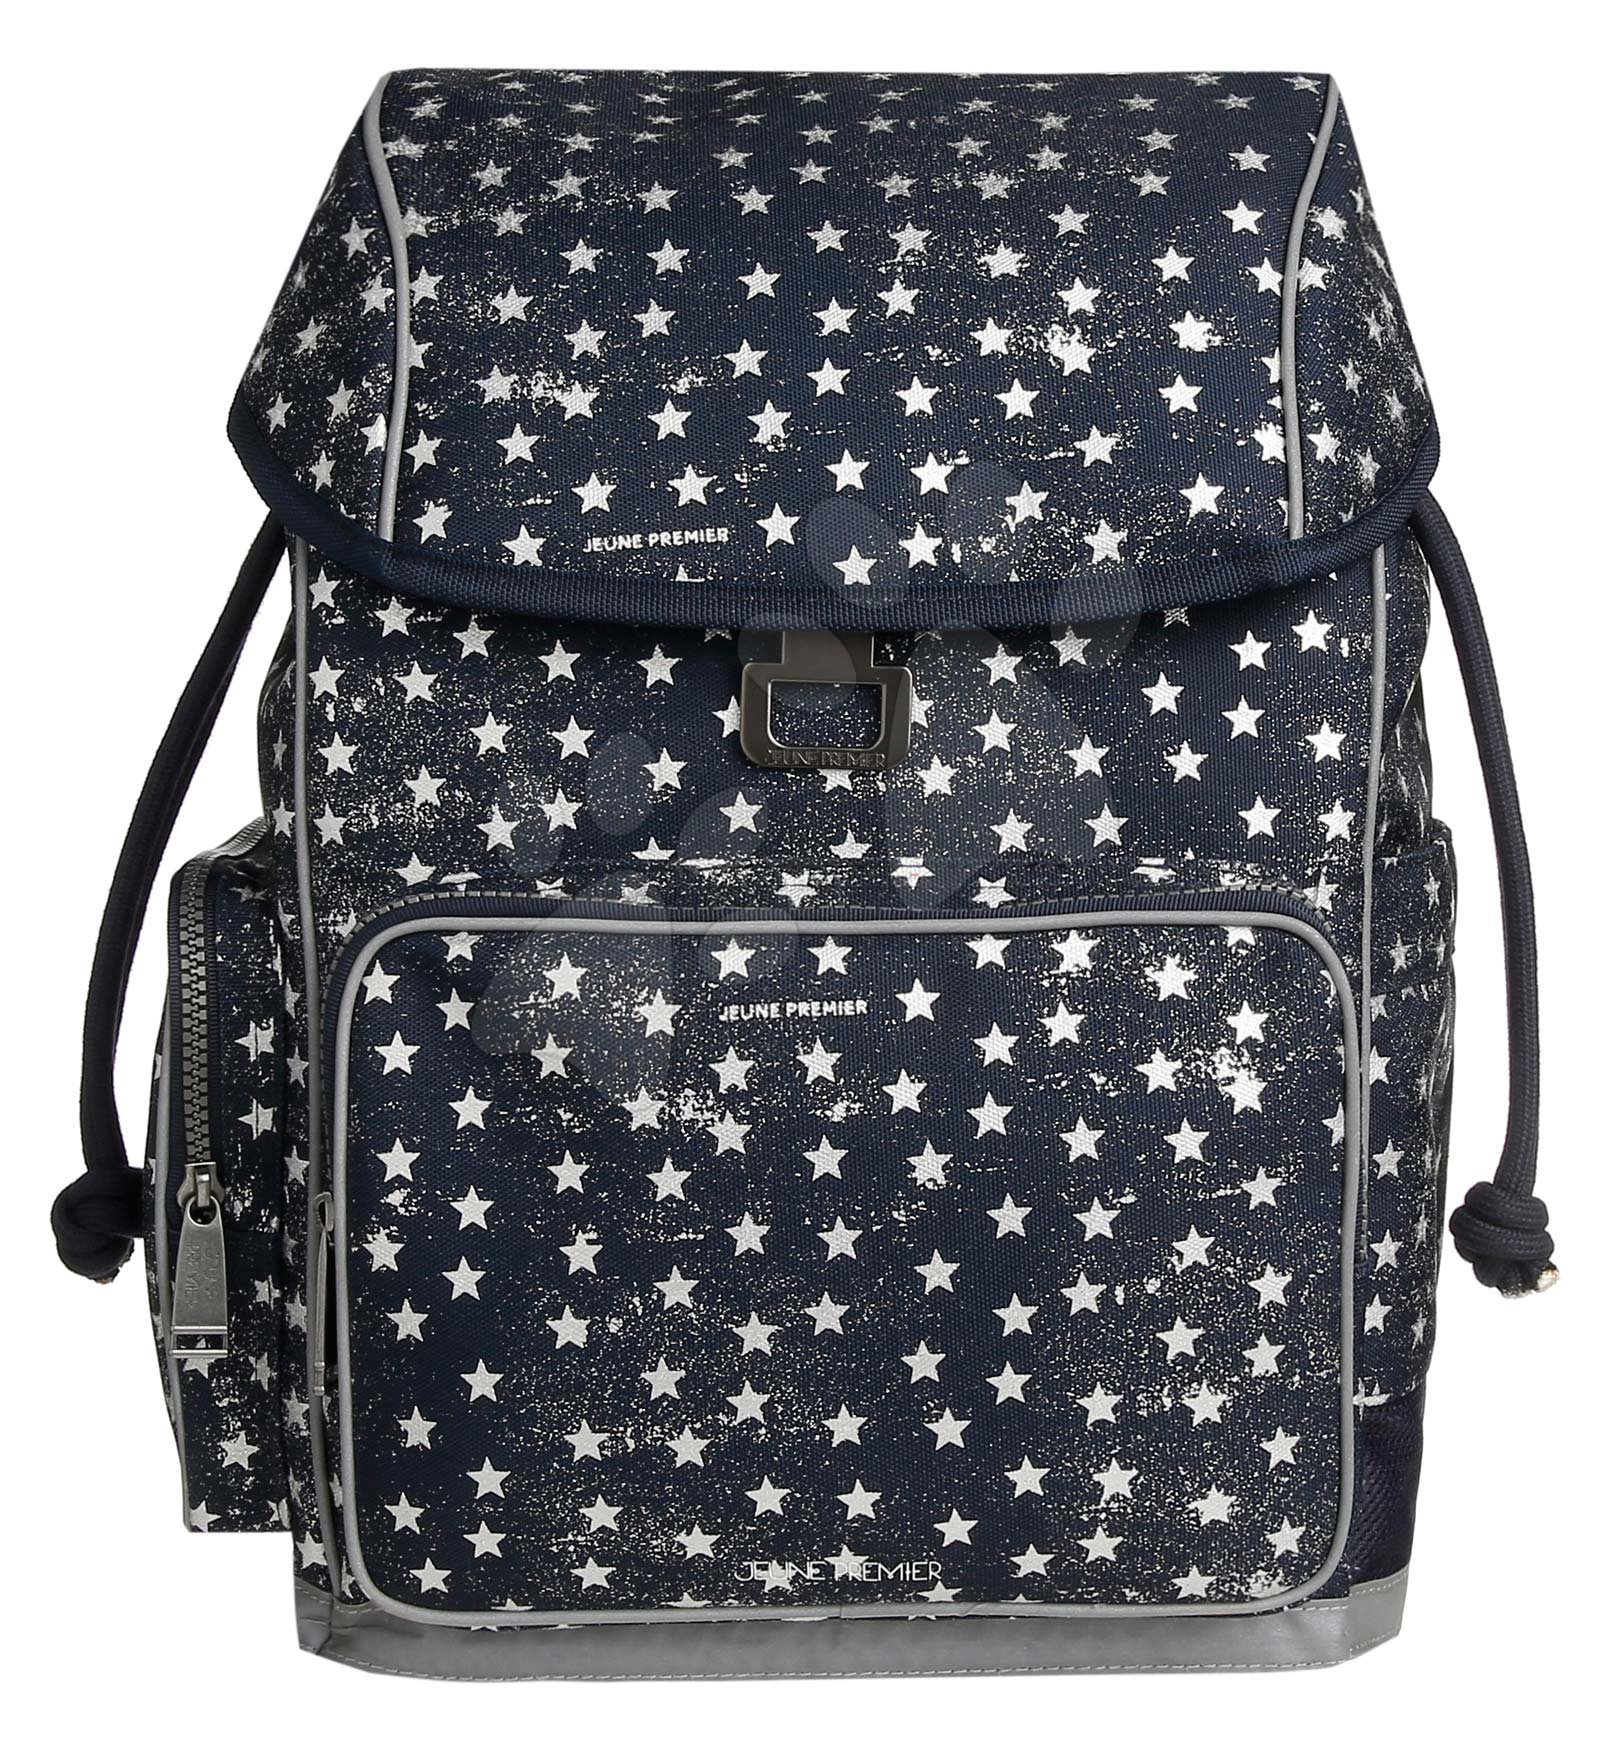 Školske torbe i ruksaci - Školski ruksak veliki Ergomax Stars Silver Jeune Premier ergonomski luksuzni dizajn